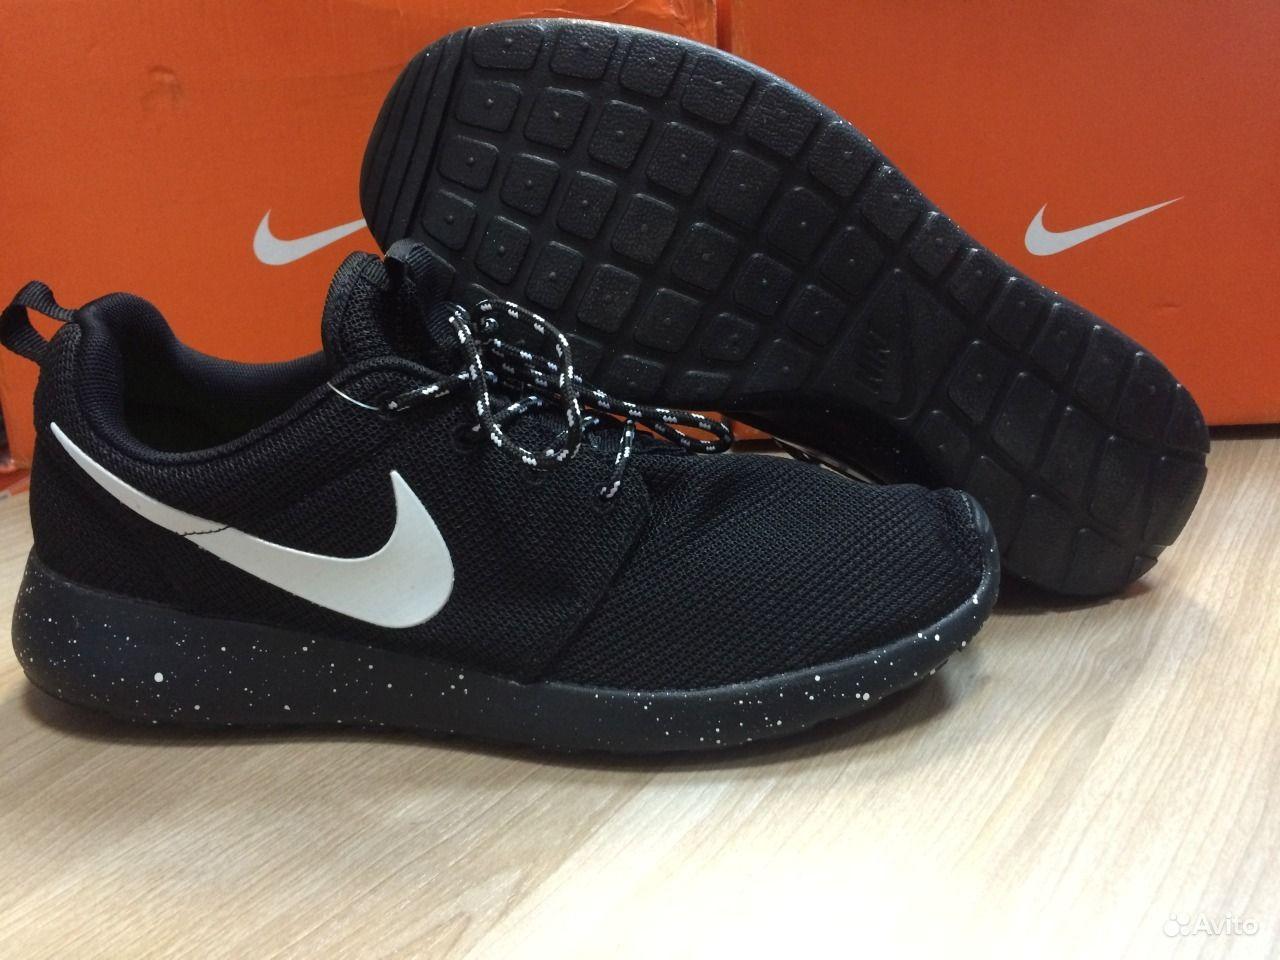 94e7d0c181a4 Nike Roshe Run. Размер eur 44 (код A-042)   Festima.Ru - Мониторинг ...